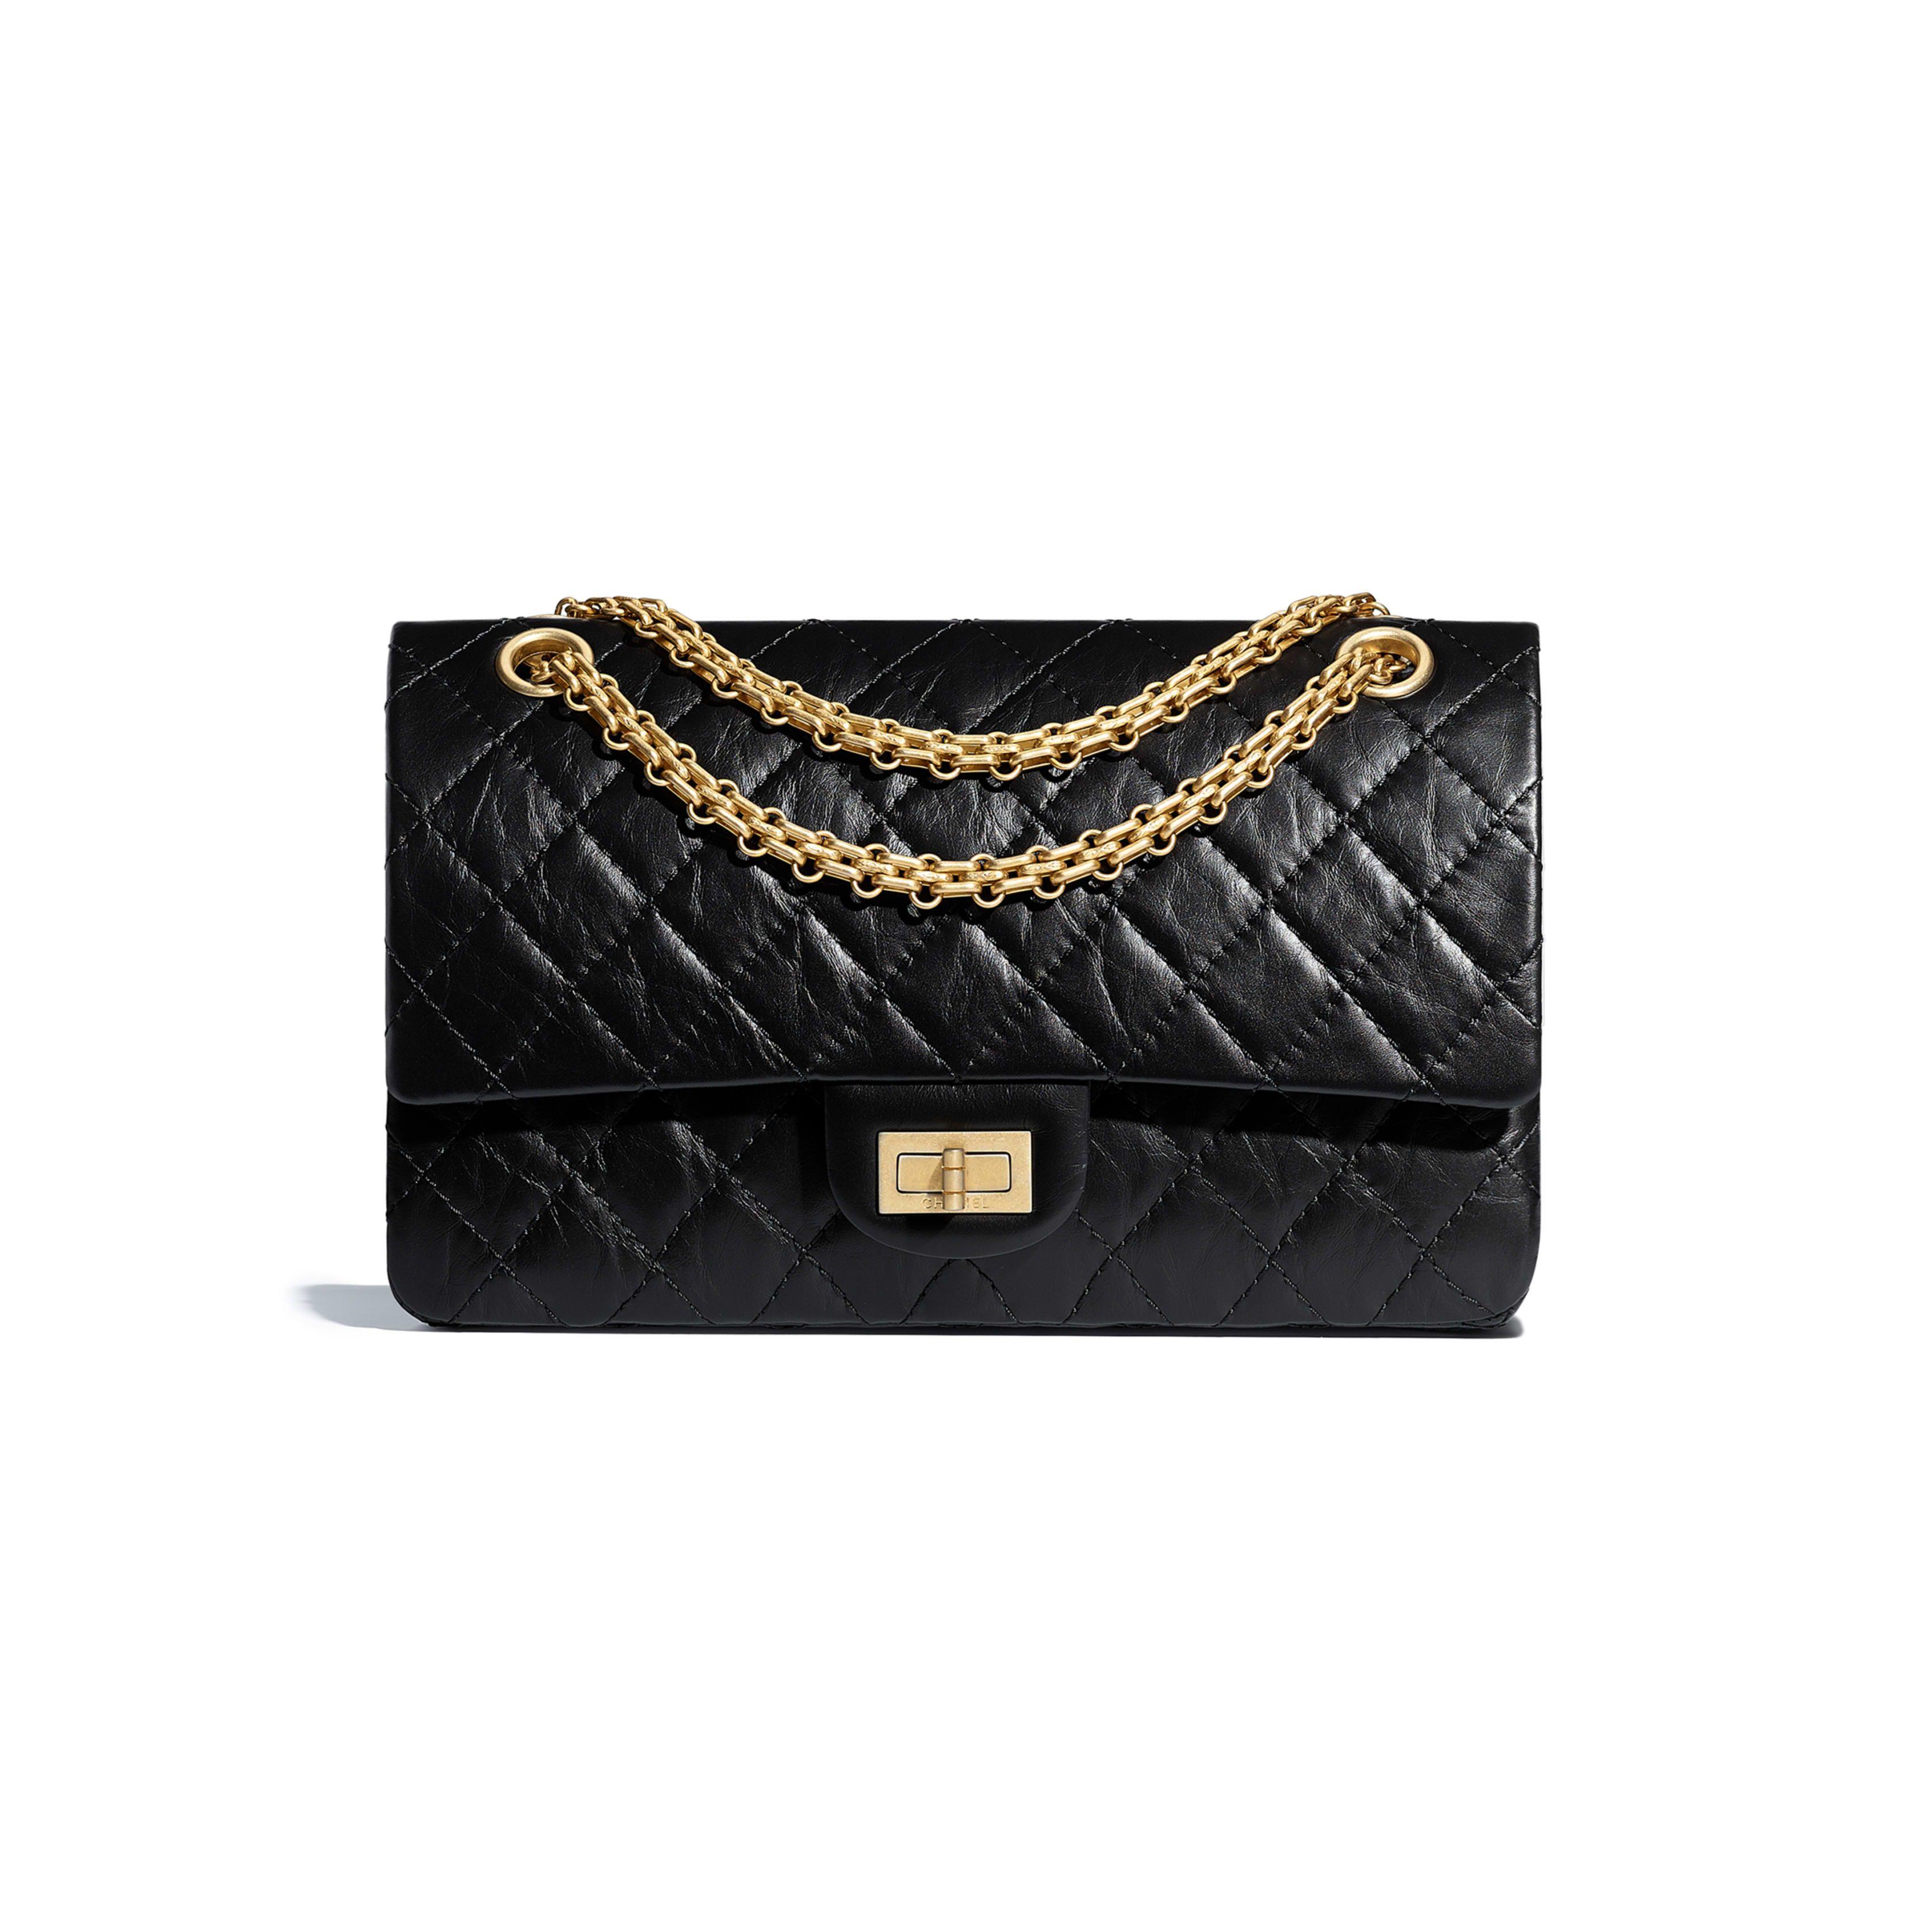 d8cc22df13 Aged Calfskin & Gold-Tone Metal Black 2.55 Handbag   Accessories ...